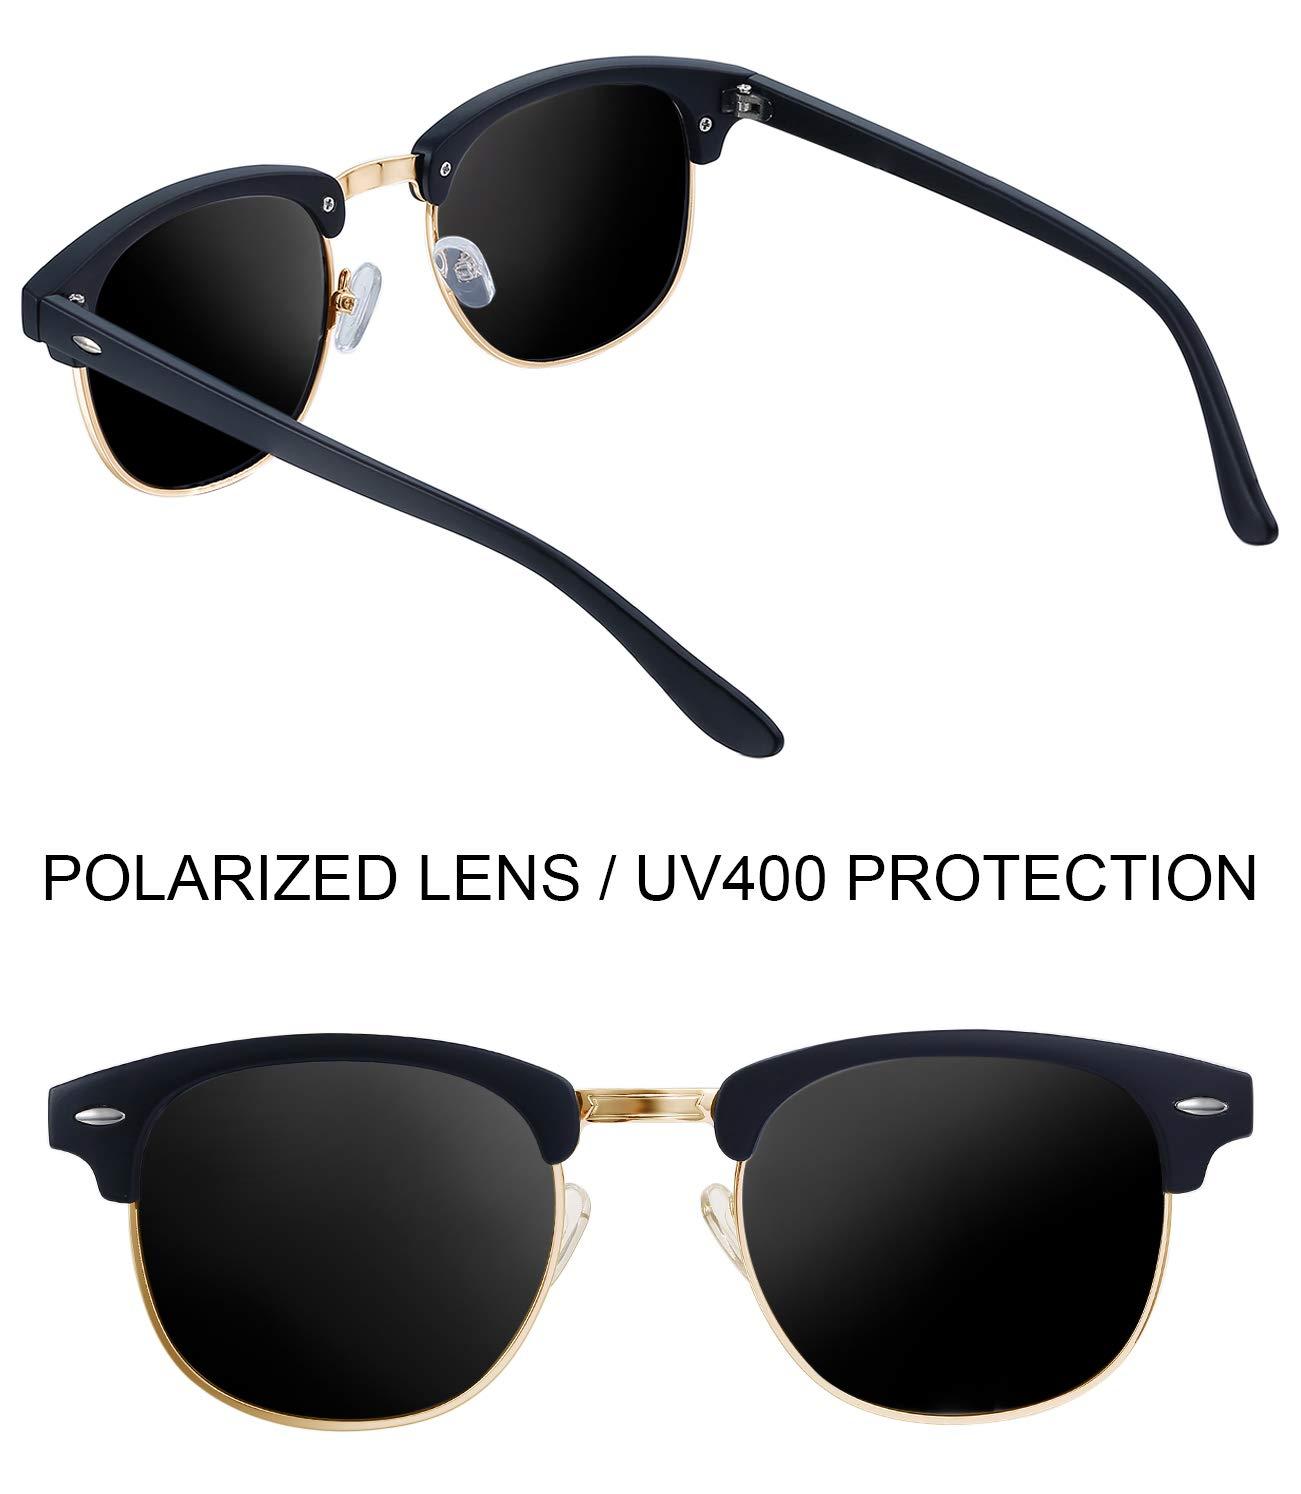 27a017e150 Joopin Semi Rimless Polarized Sunglasses Women Men Brand Vintage Glasses  Plaroid Lens Sun Glasses (Matte Black Frame Grey Lens)